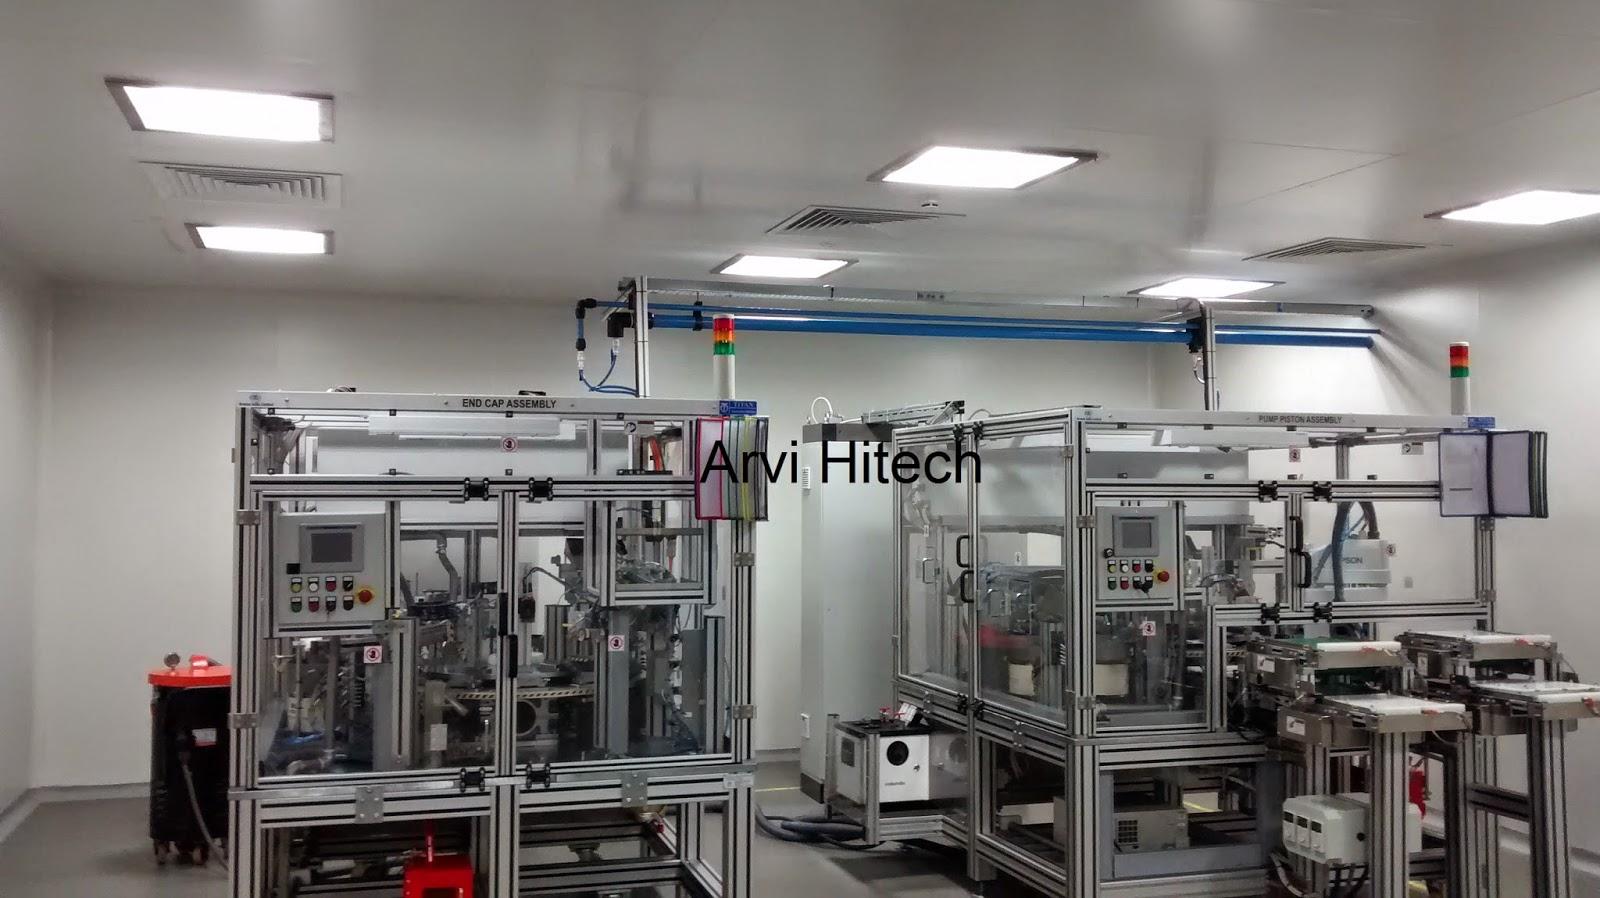 Arvihitech Compressed Air Piping Arvi Hitech